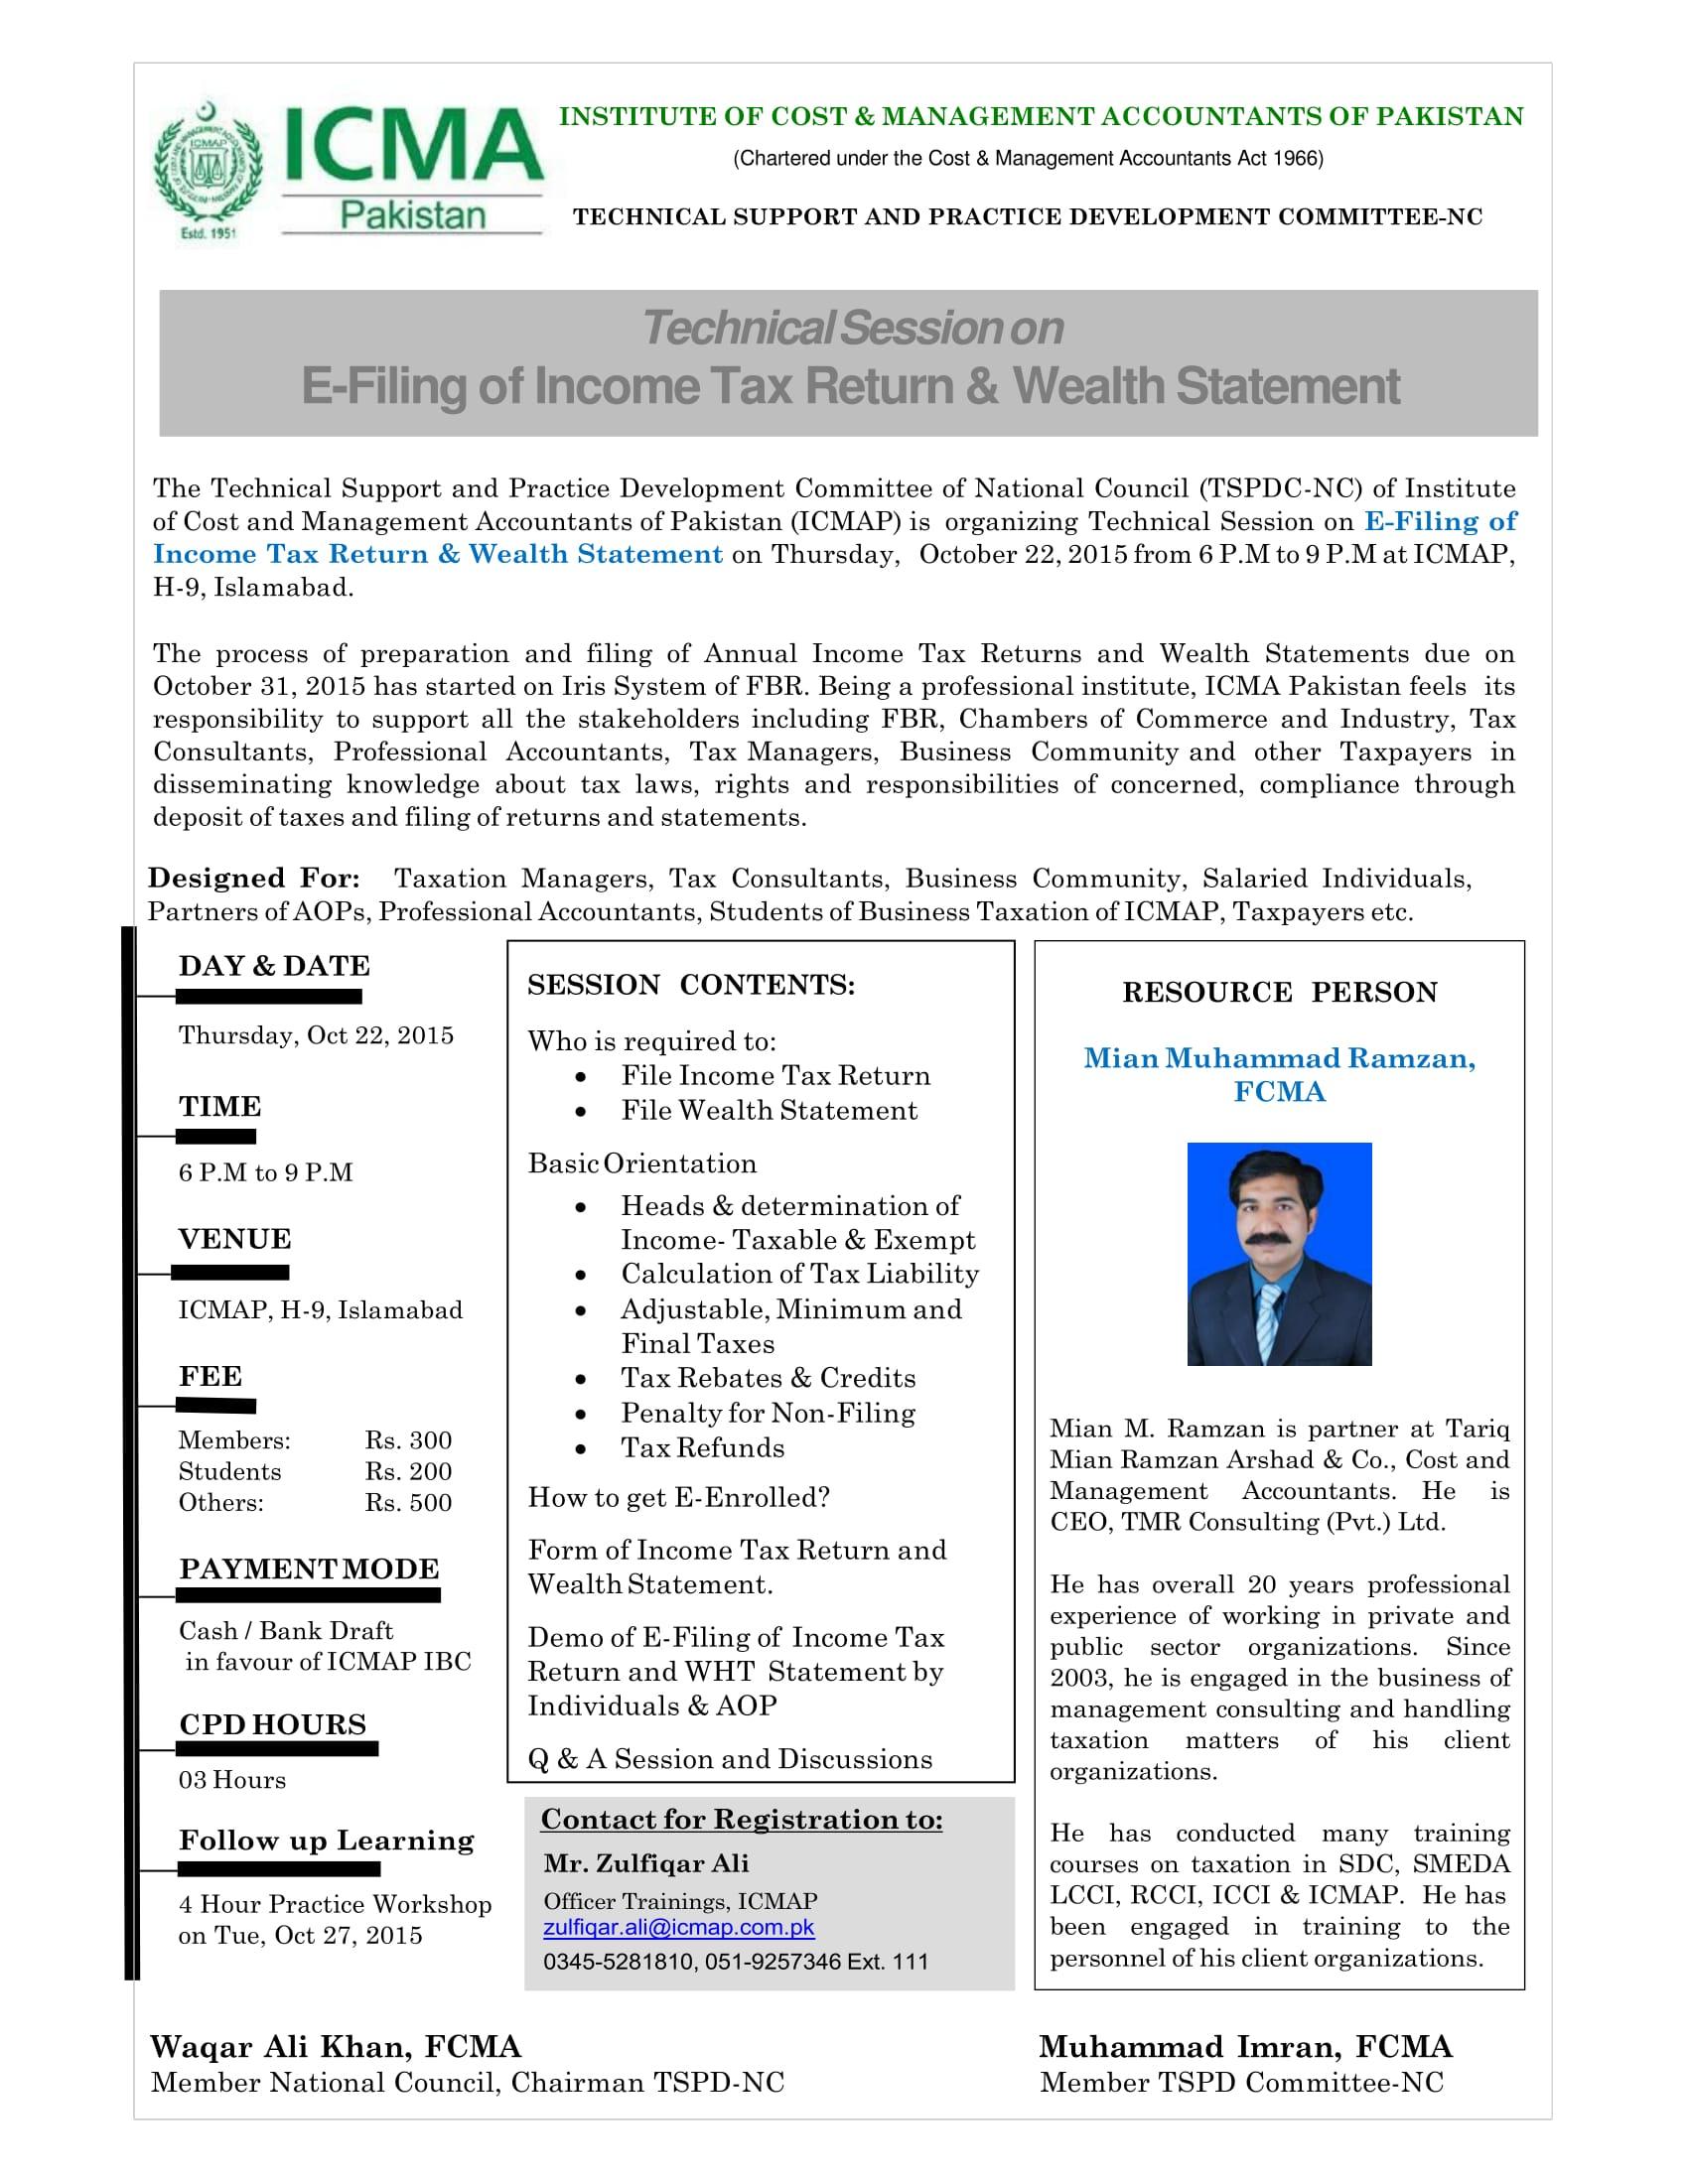 wealth statement event registration form 1